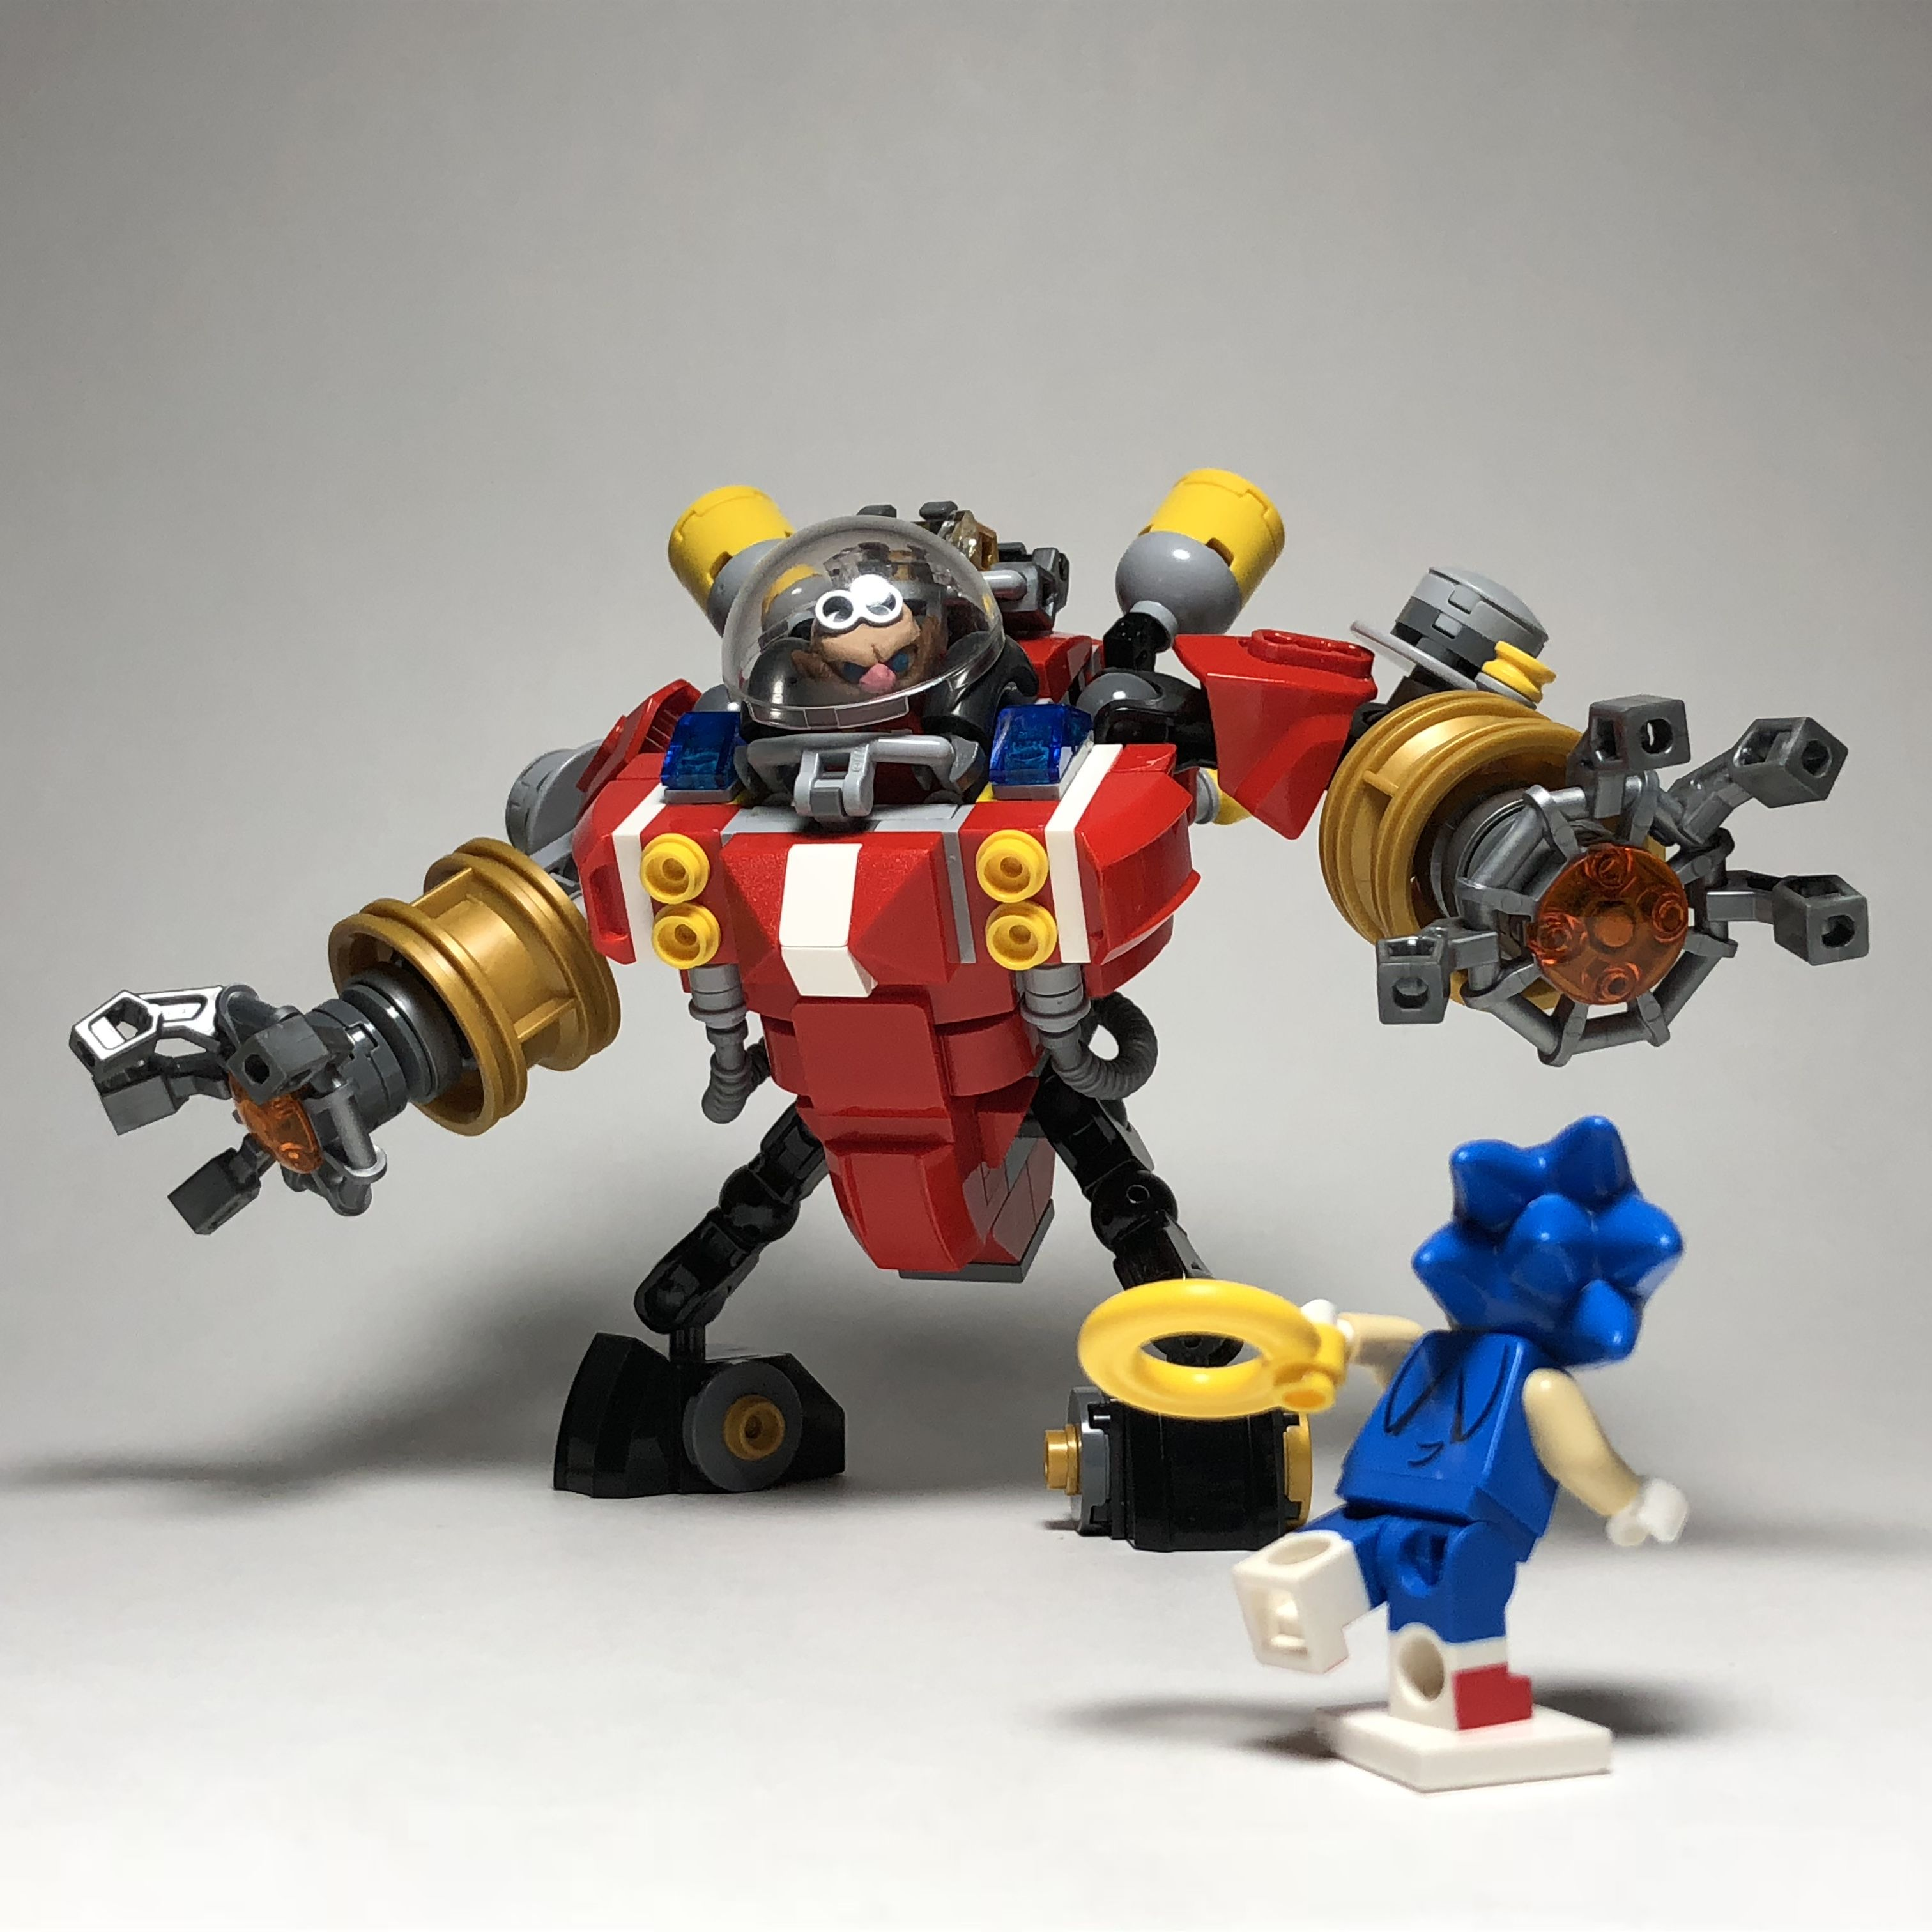 Lego Ideas Sonic The Hedgehog Vs Dr Eggman Lego Design Cool Lego Creations Lego Robot